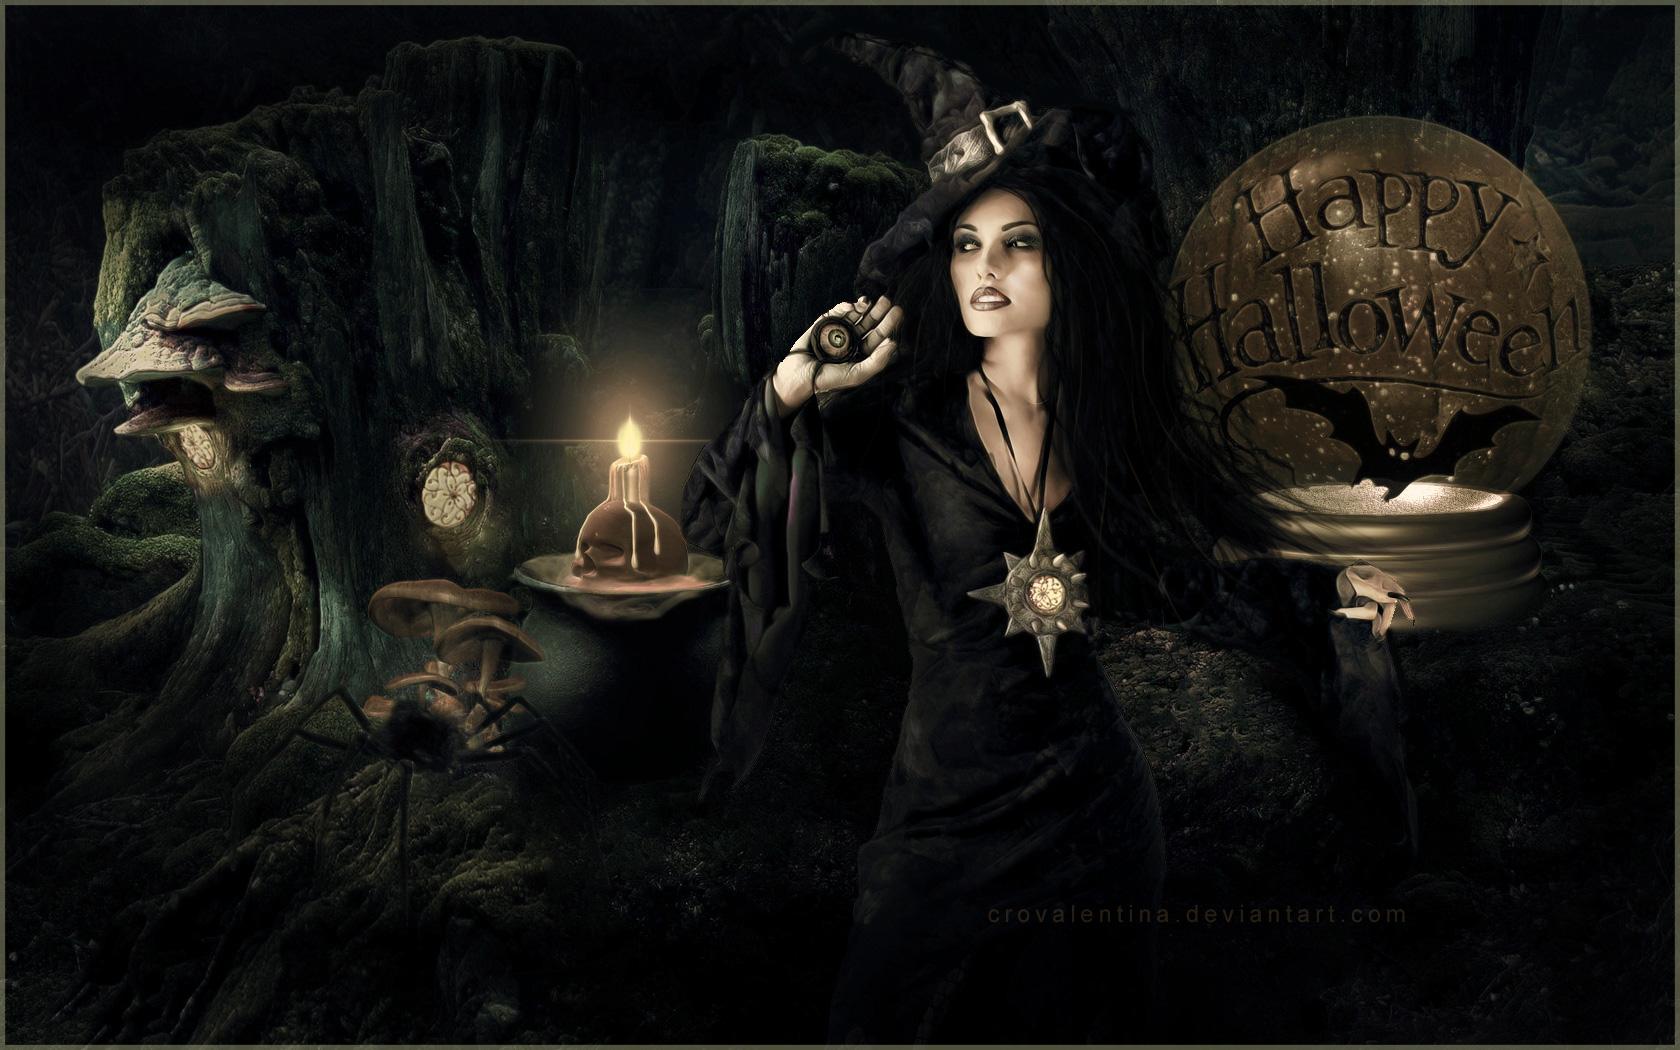 Halloween 2013 Backgrounds Wallpapers 1680x1050